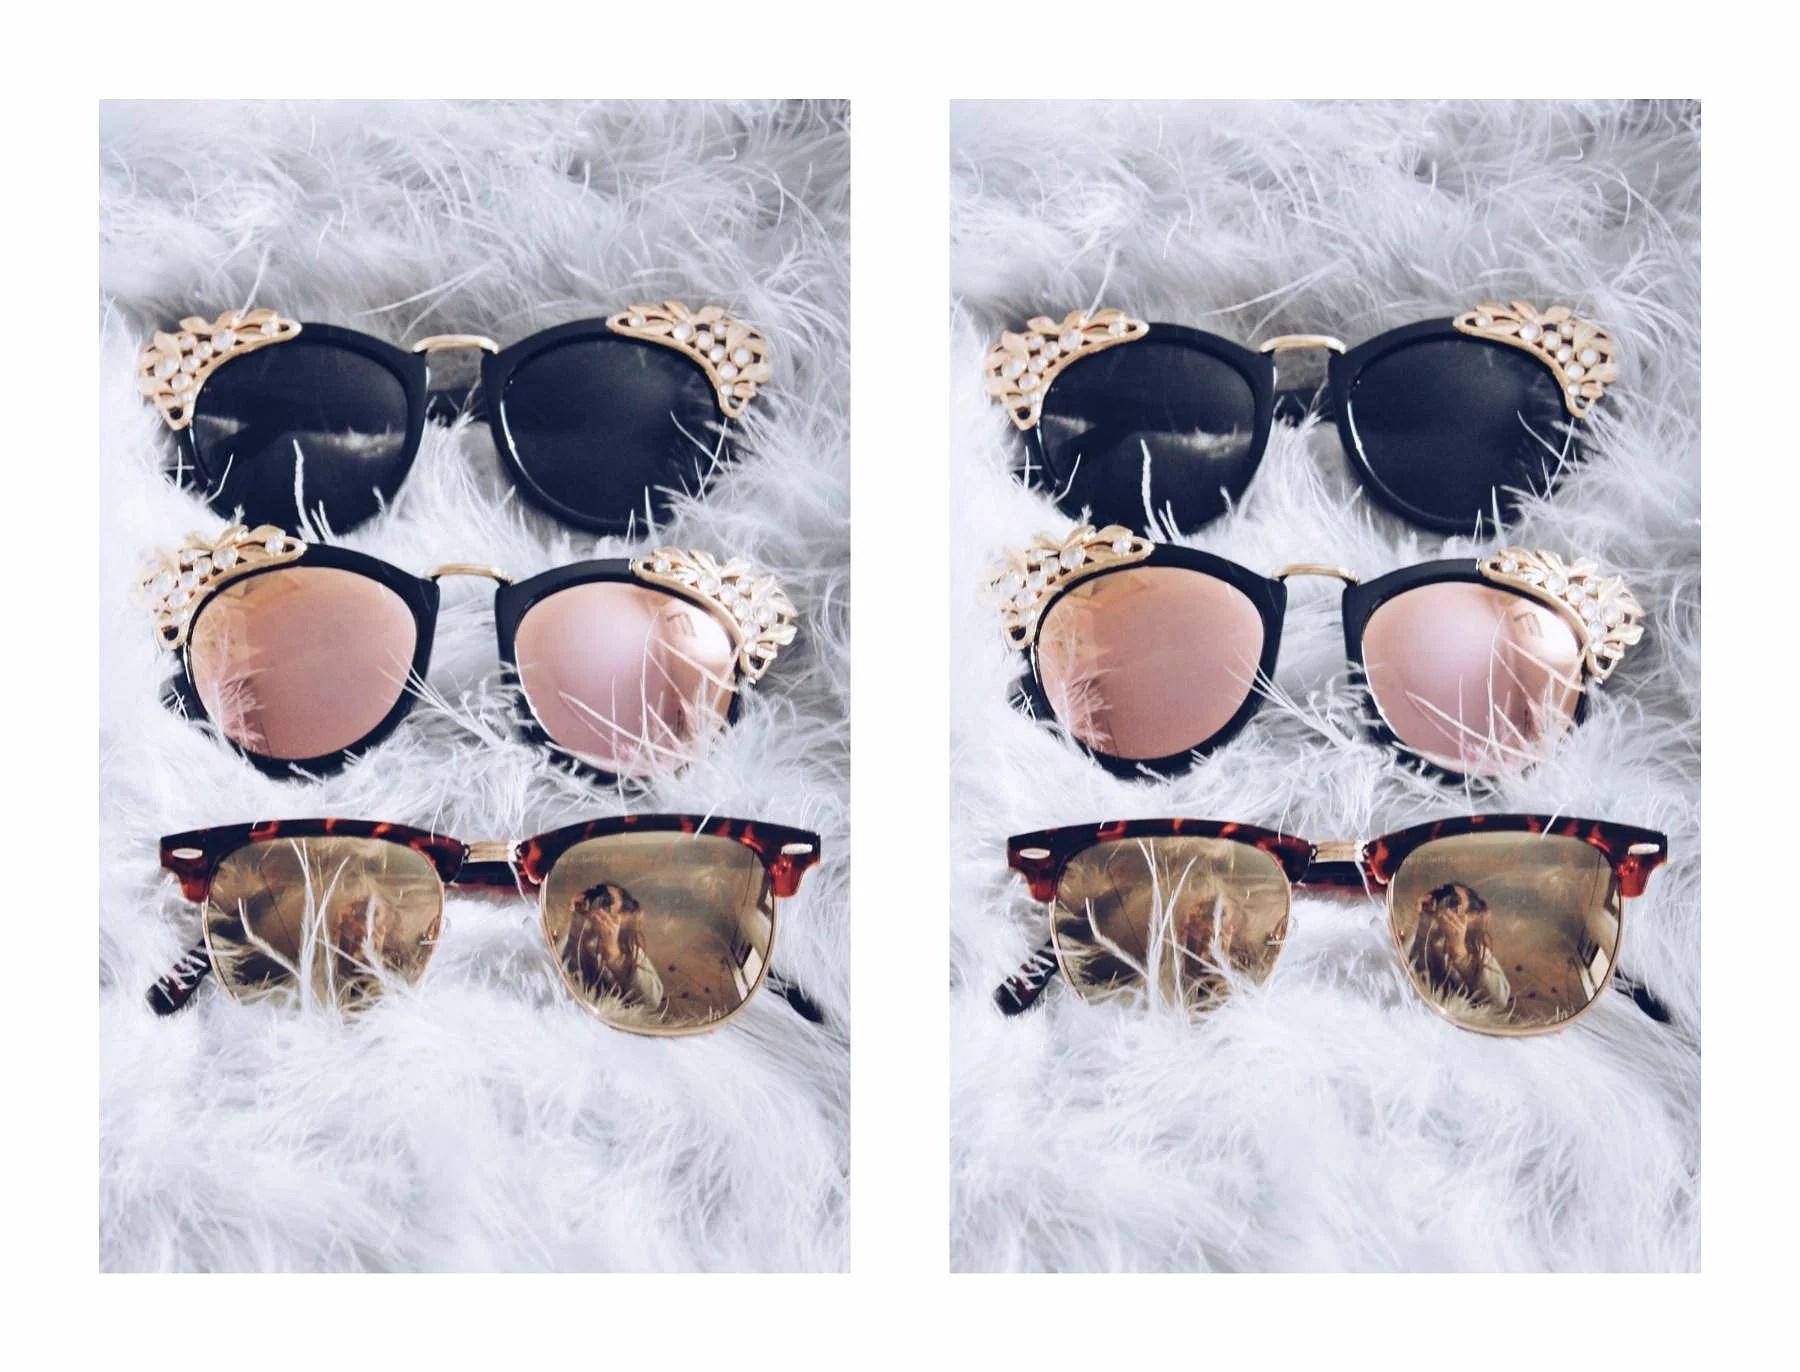 Solglasögon - Mina favoriter